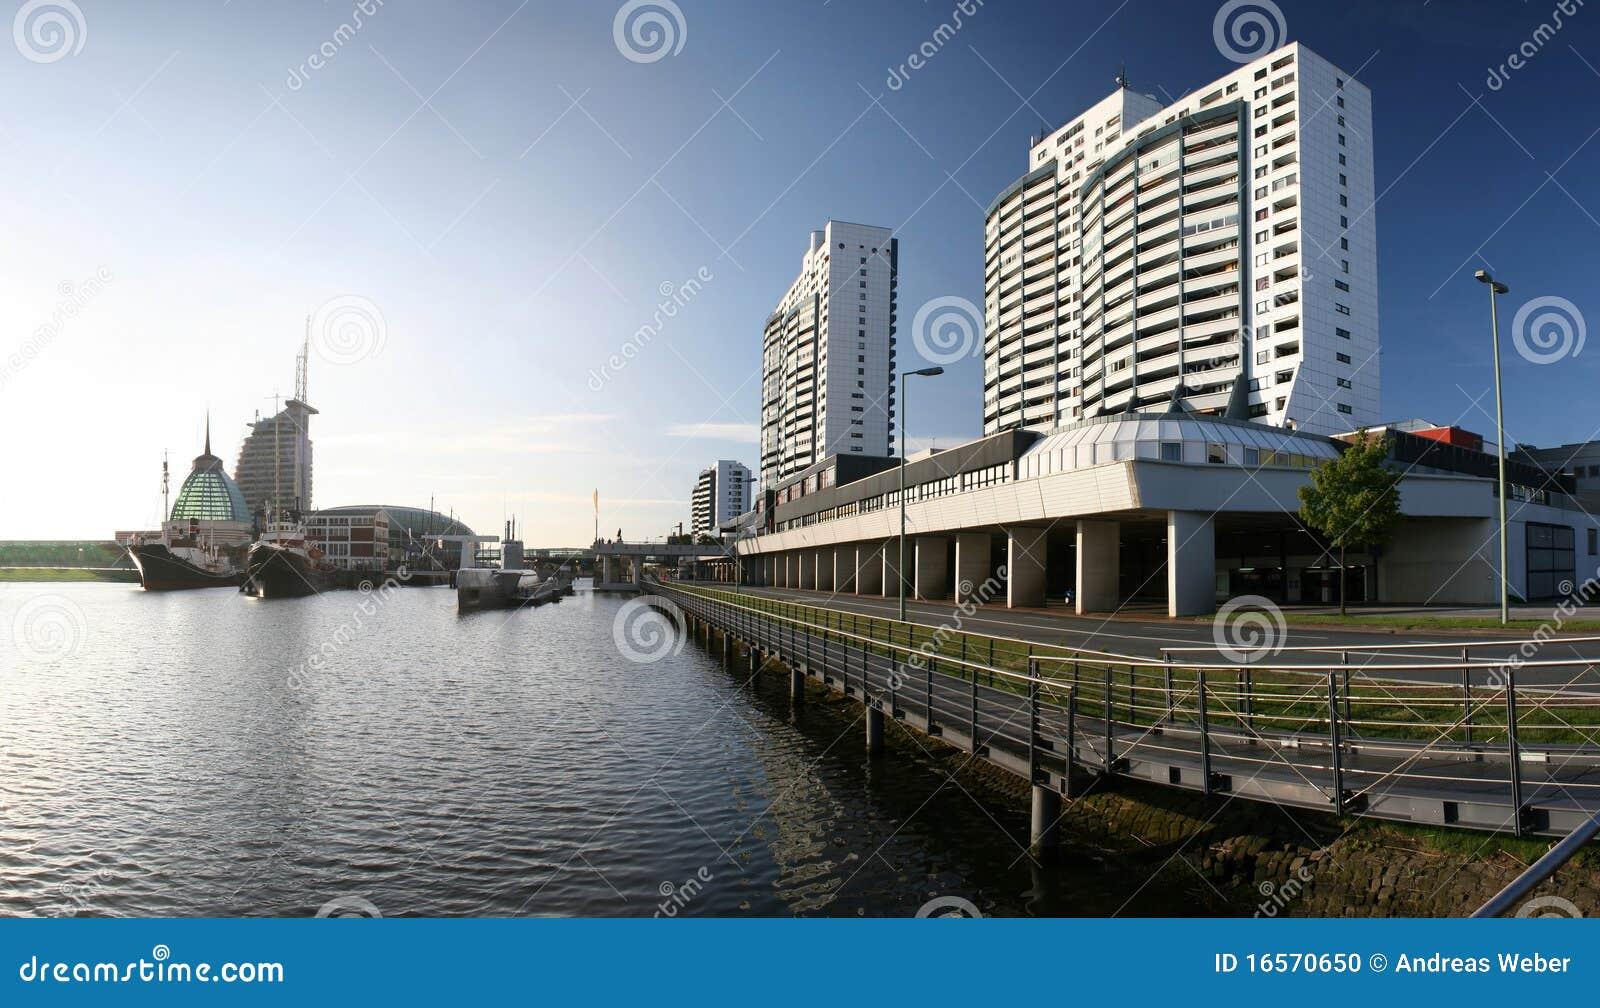 Bremerhaven德国港口